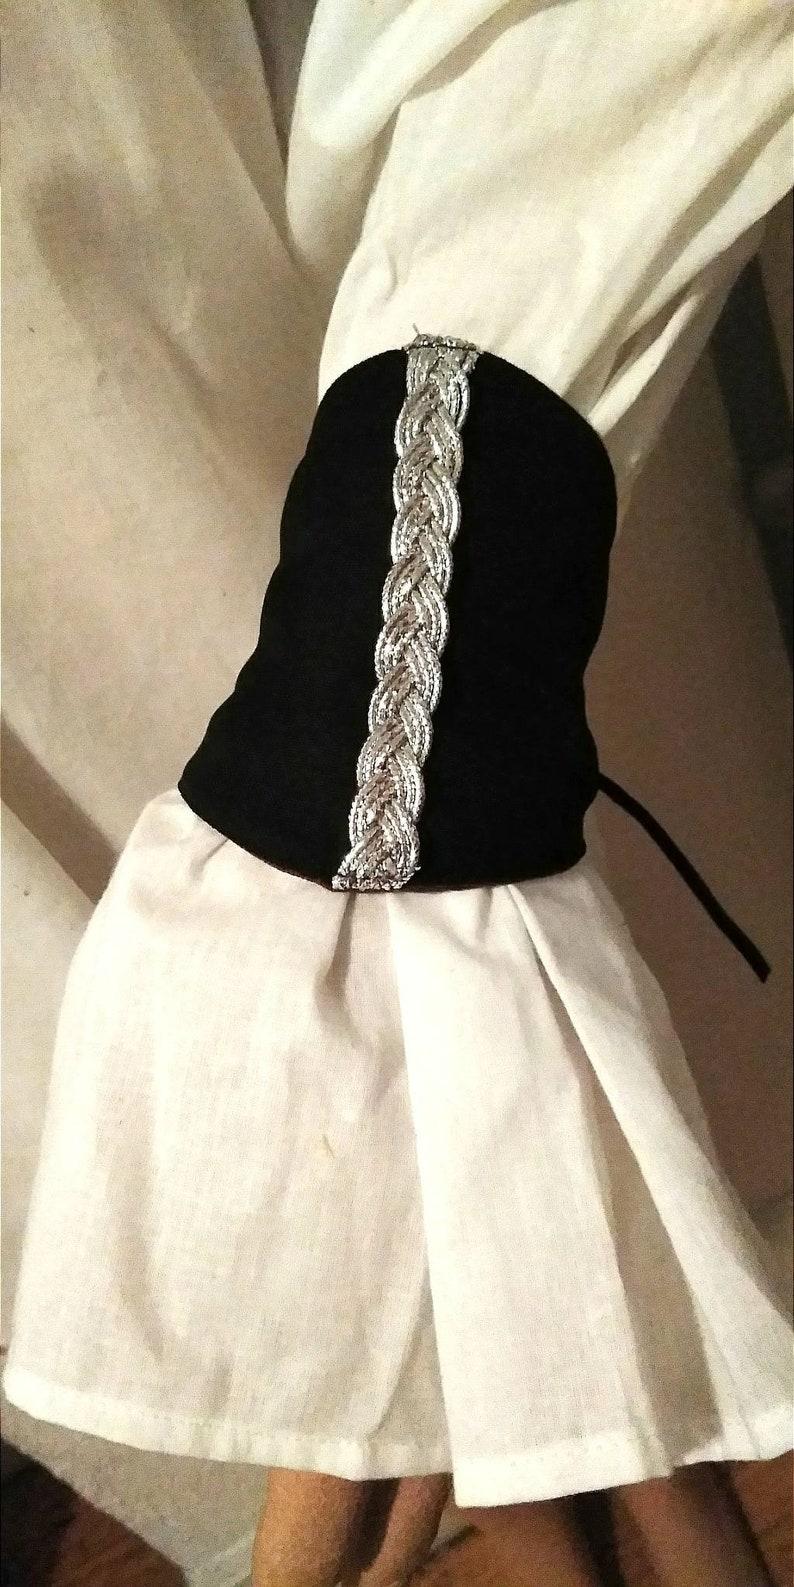 Black Wrist Gauntlets e Silver Metallic Braided Trim